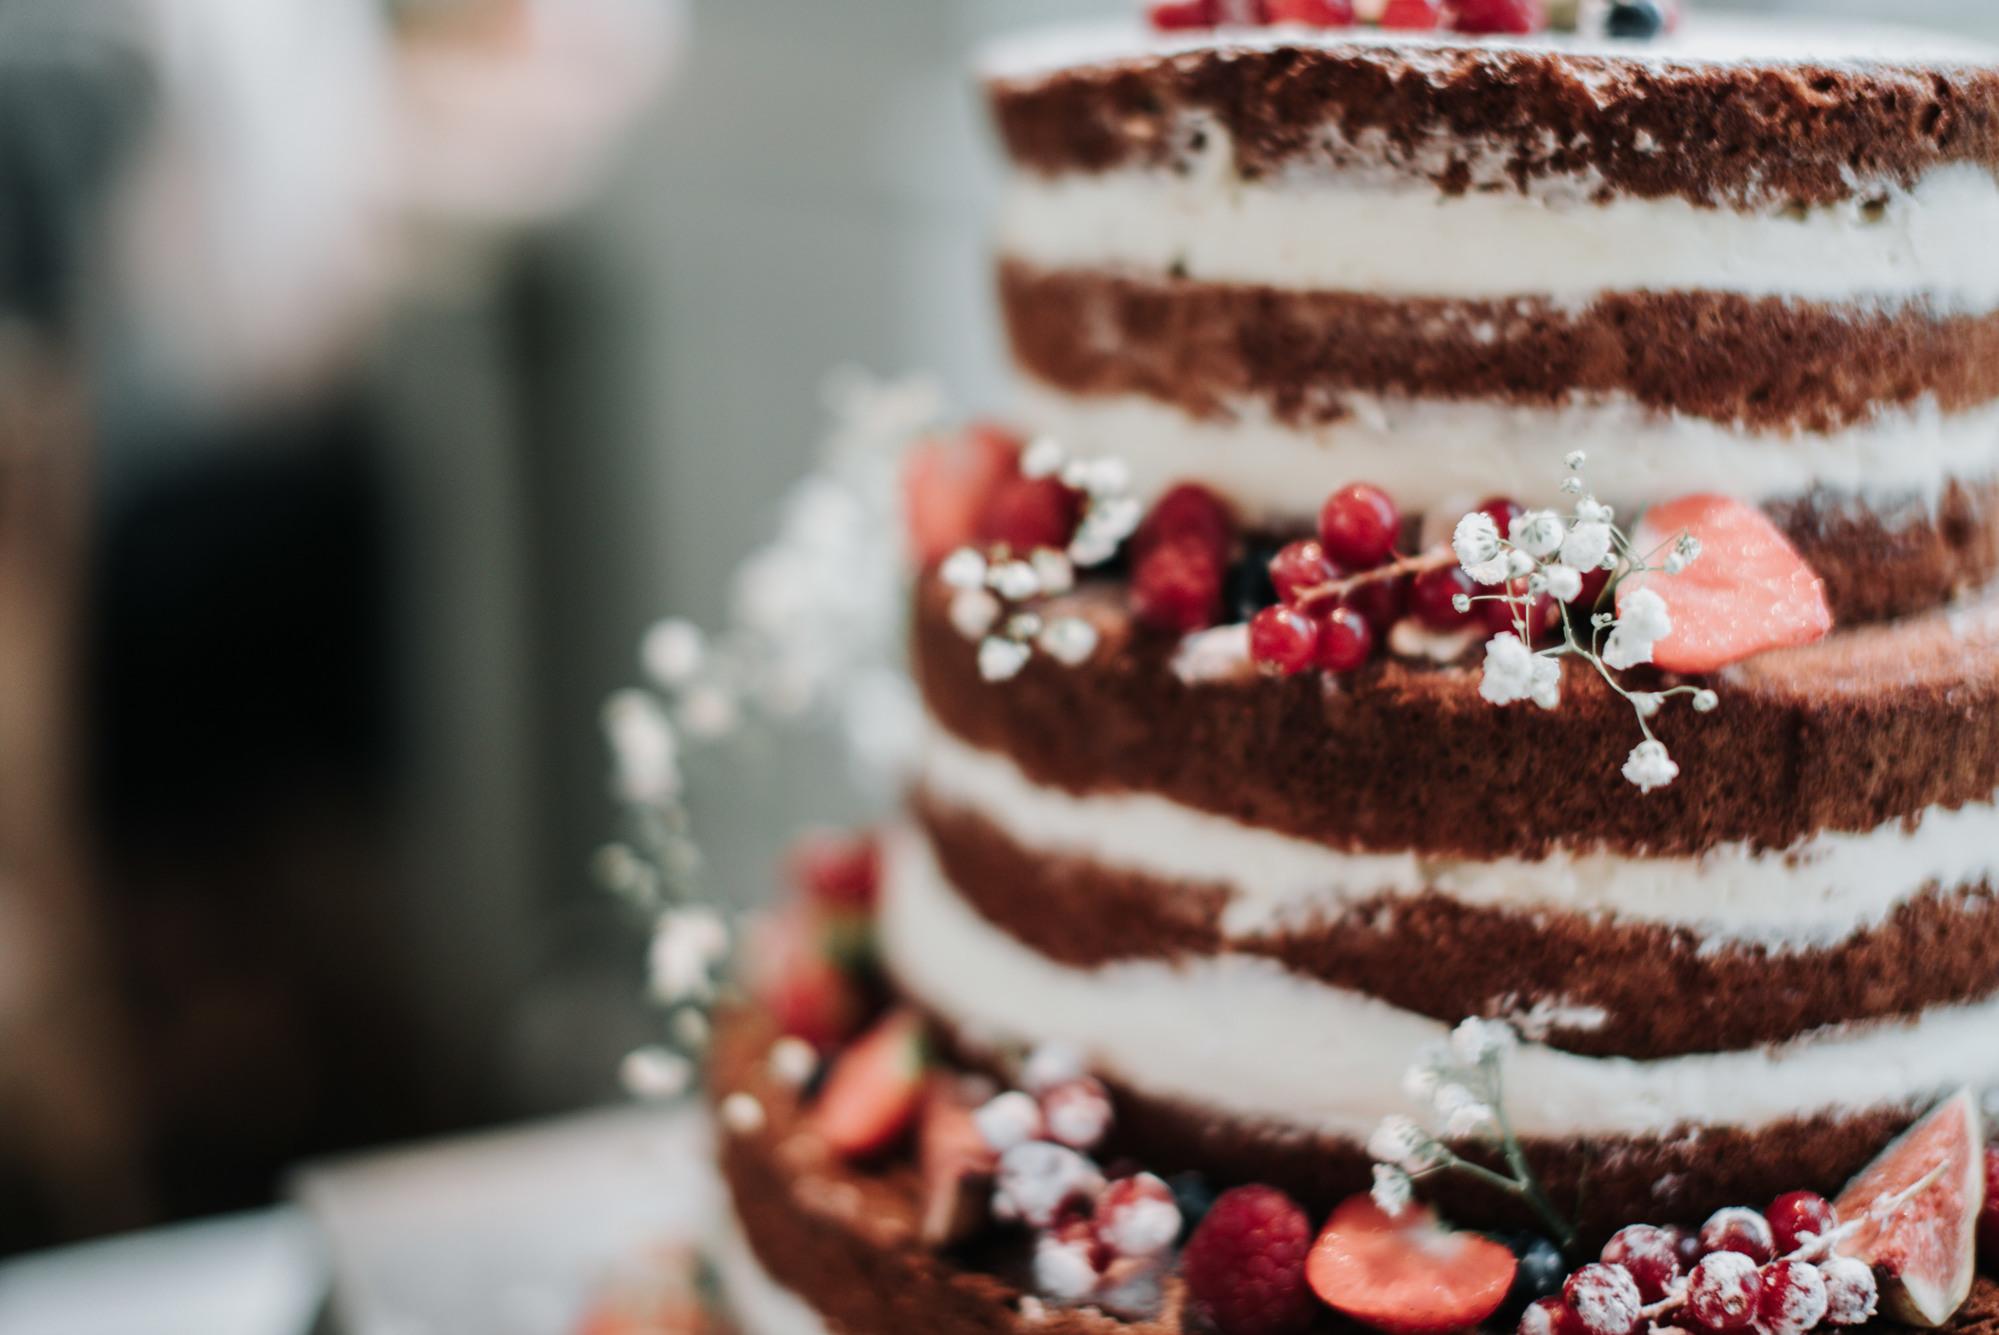 Wedding photography, dougal photography, dougal film, wedding cake, wedding video